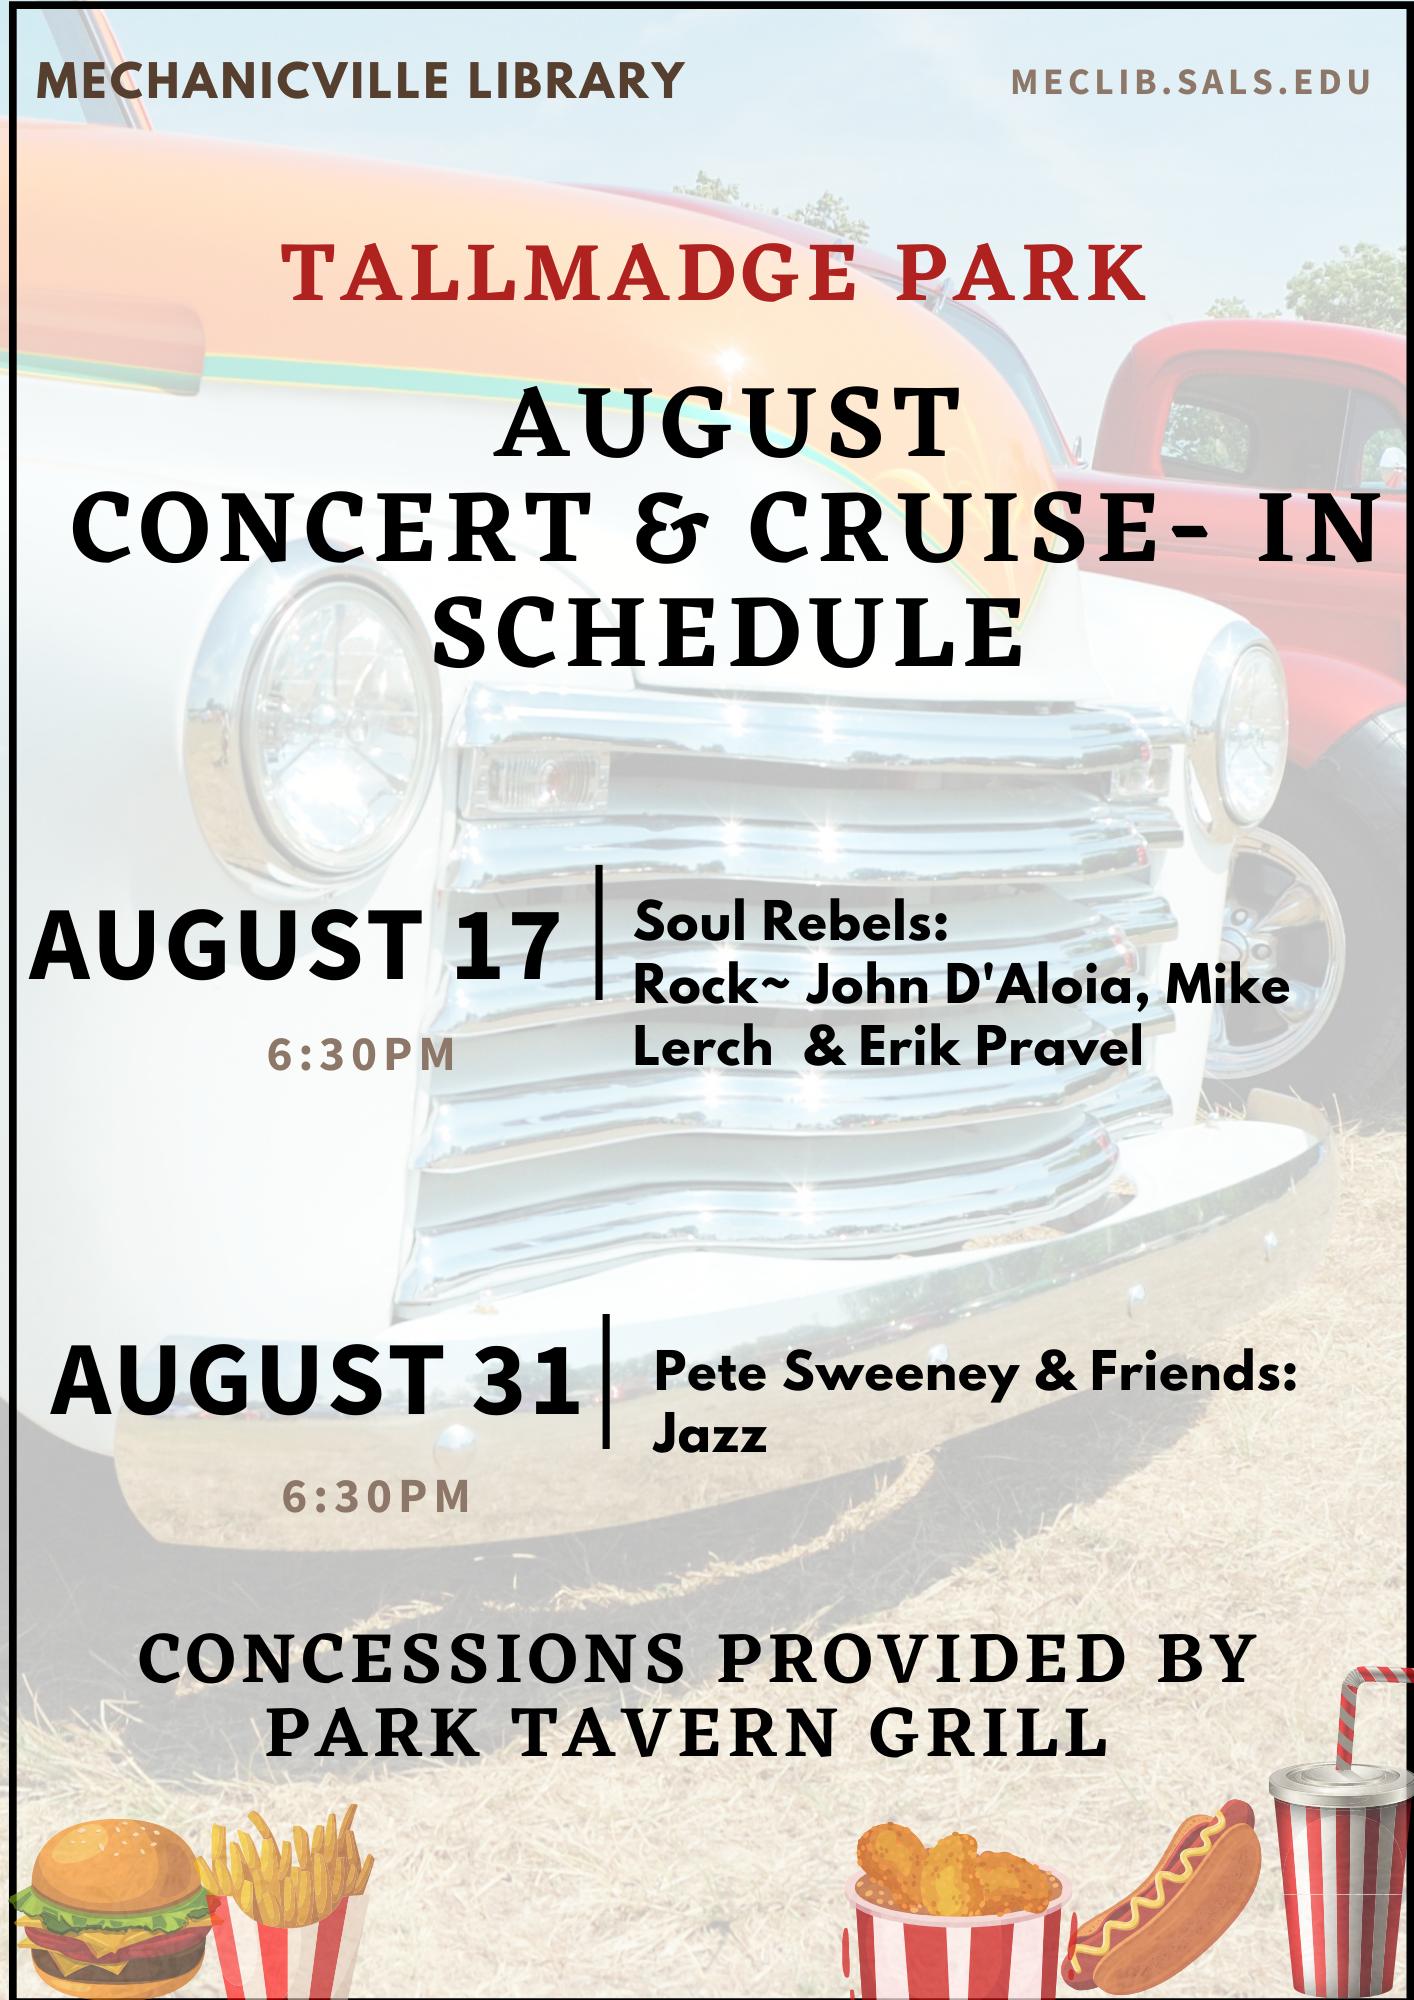 Cruise-In & Concert in Tallmadge Park @ Tallmadge Park | Mechanicville | New York | United States